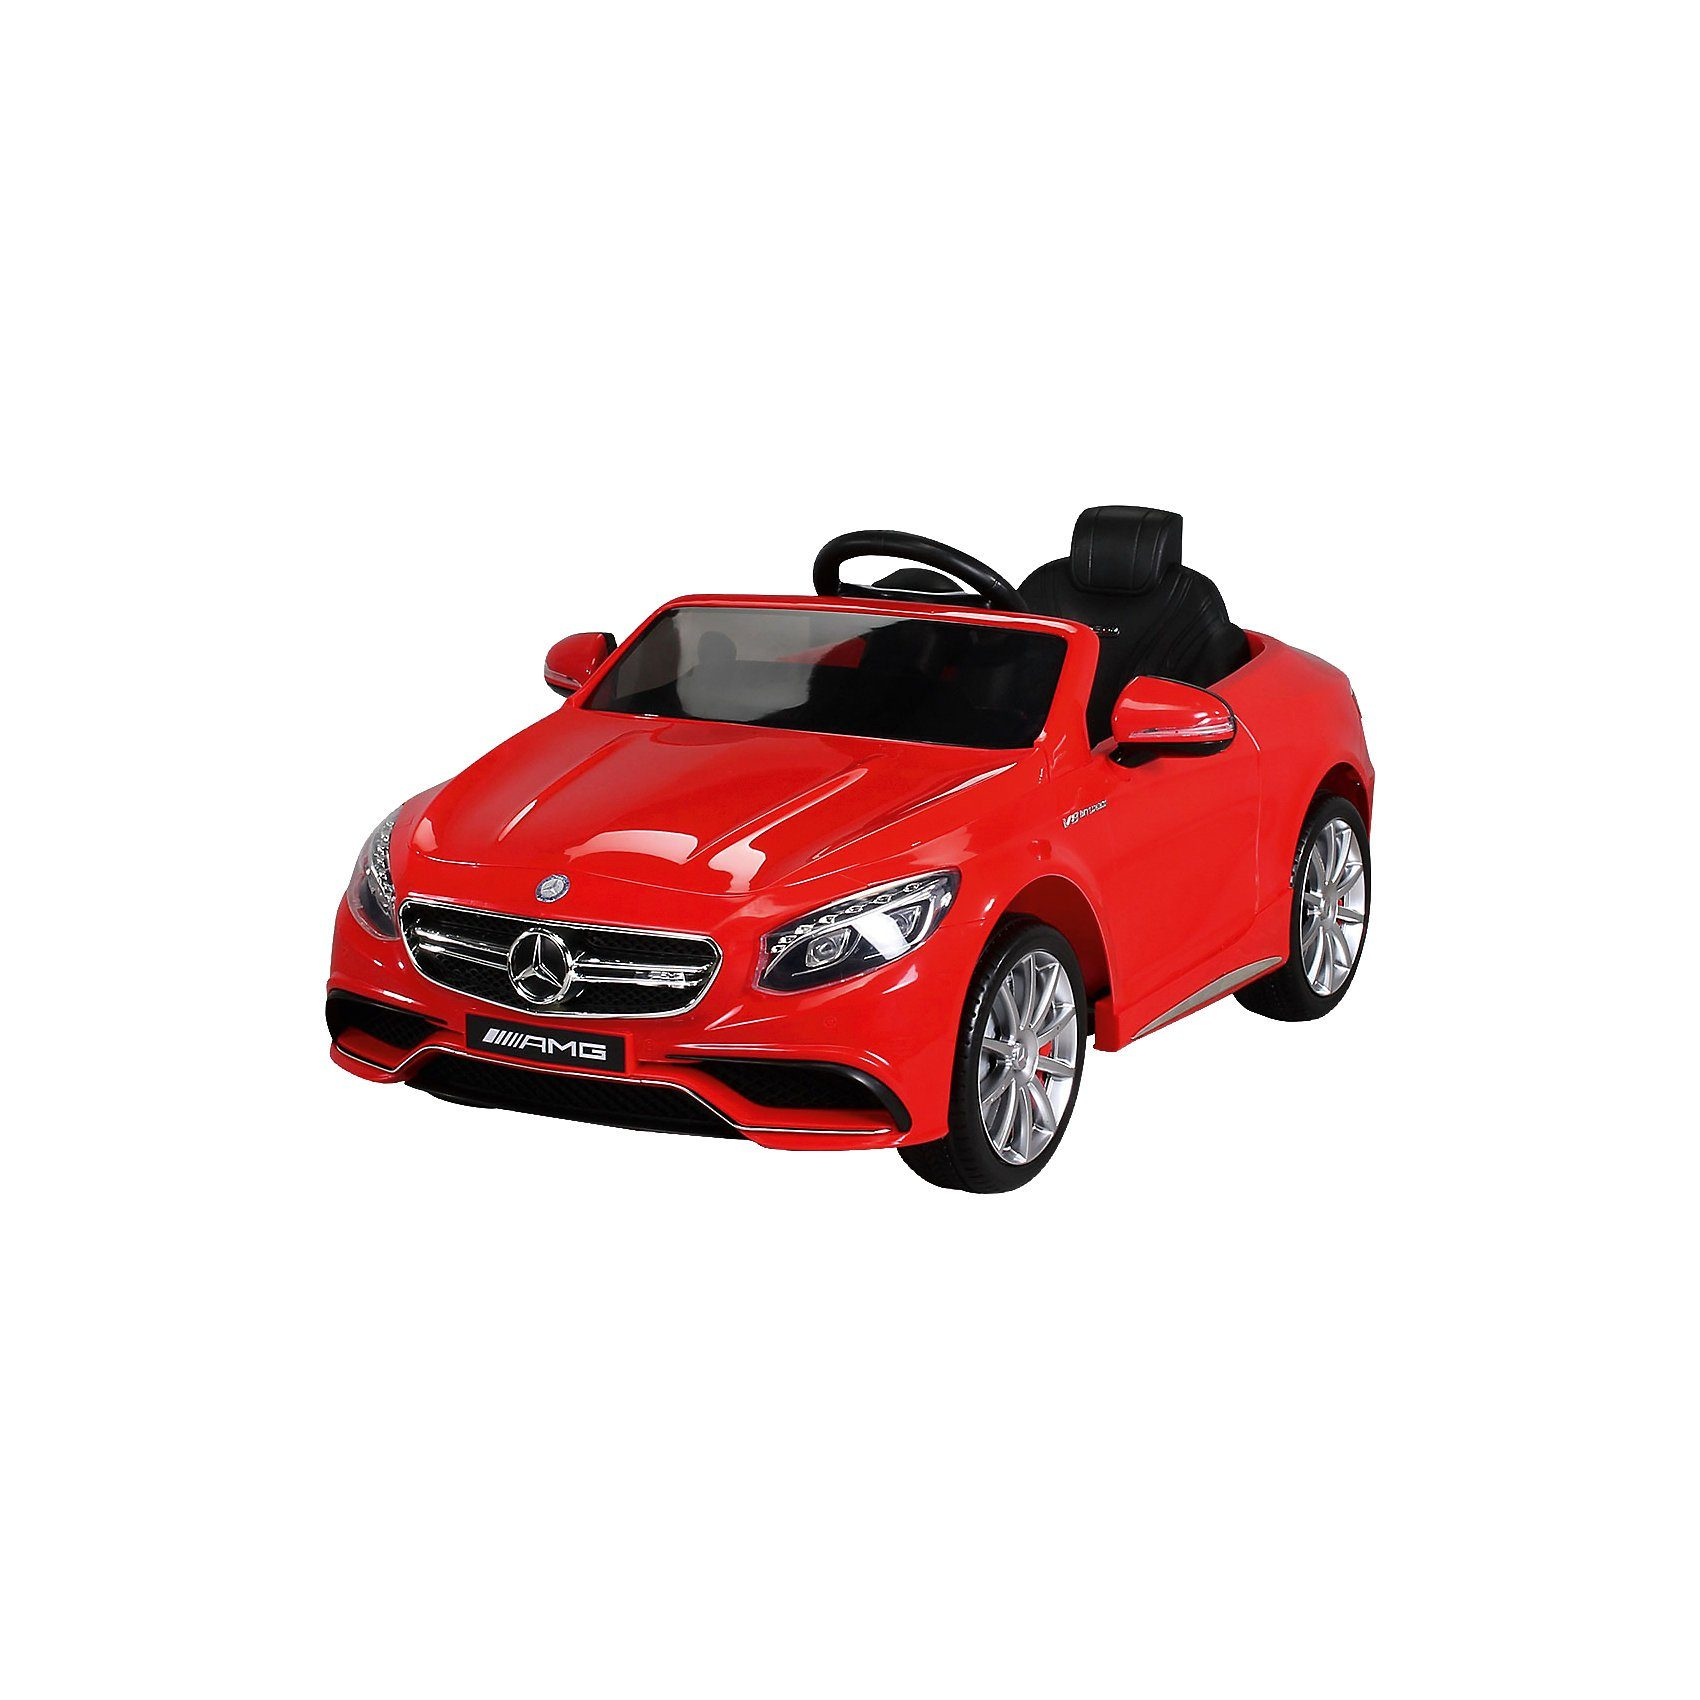 Kinder Elektroauto Mercedes S63 AMG Lizenziert, rot